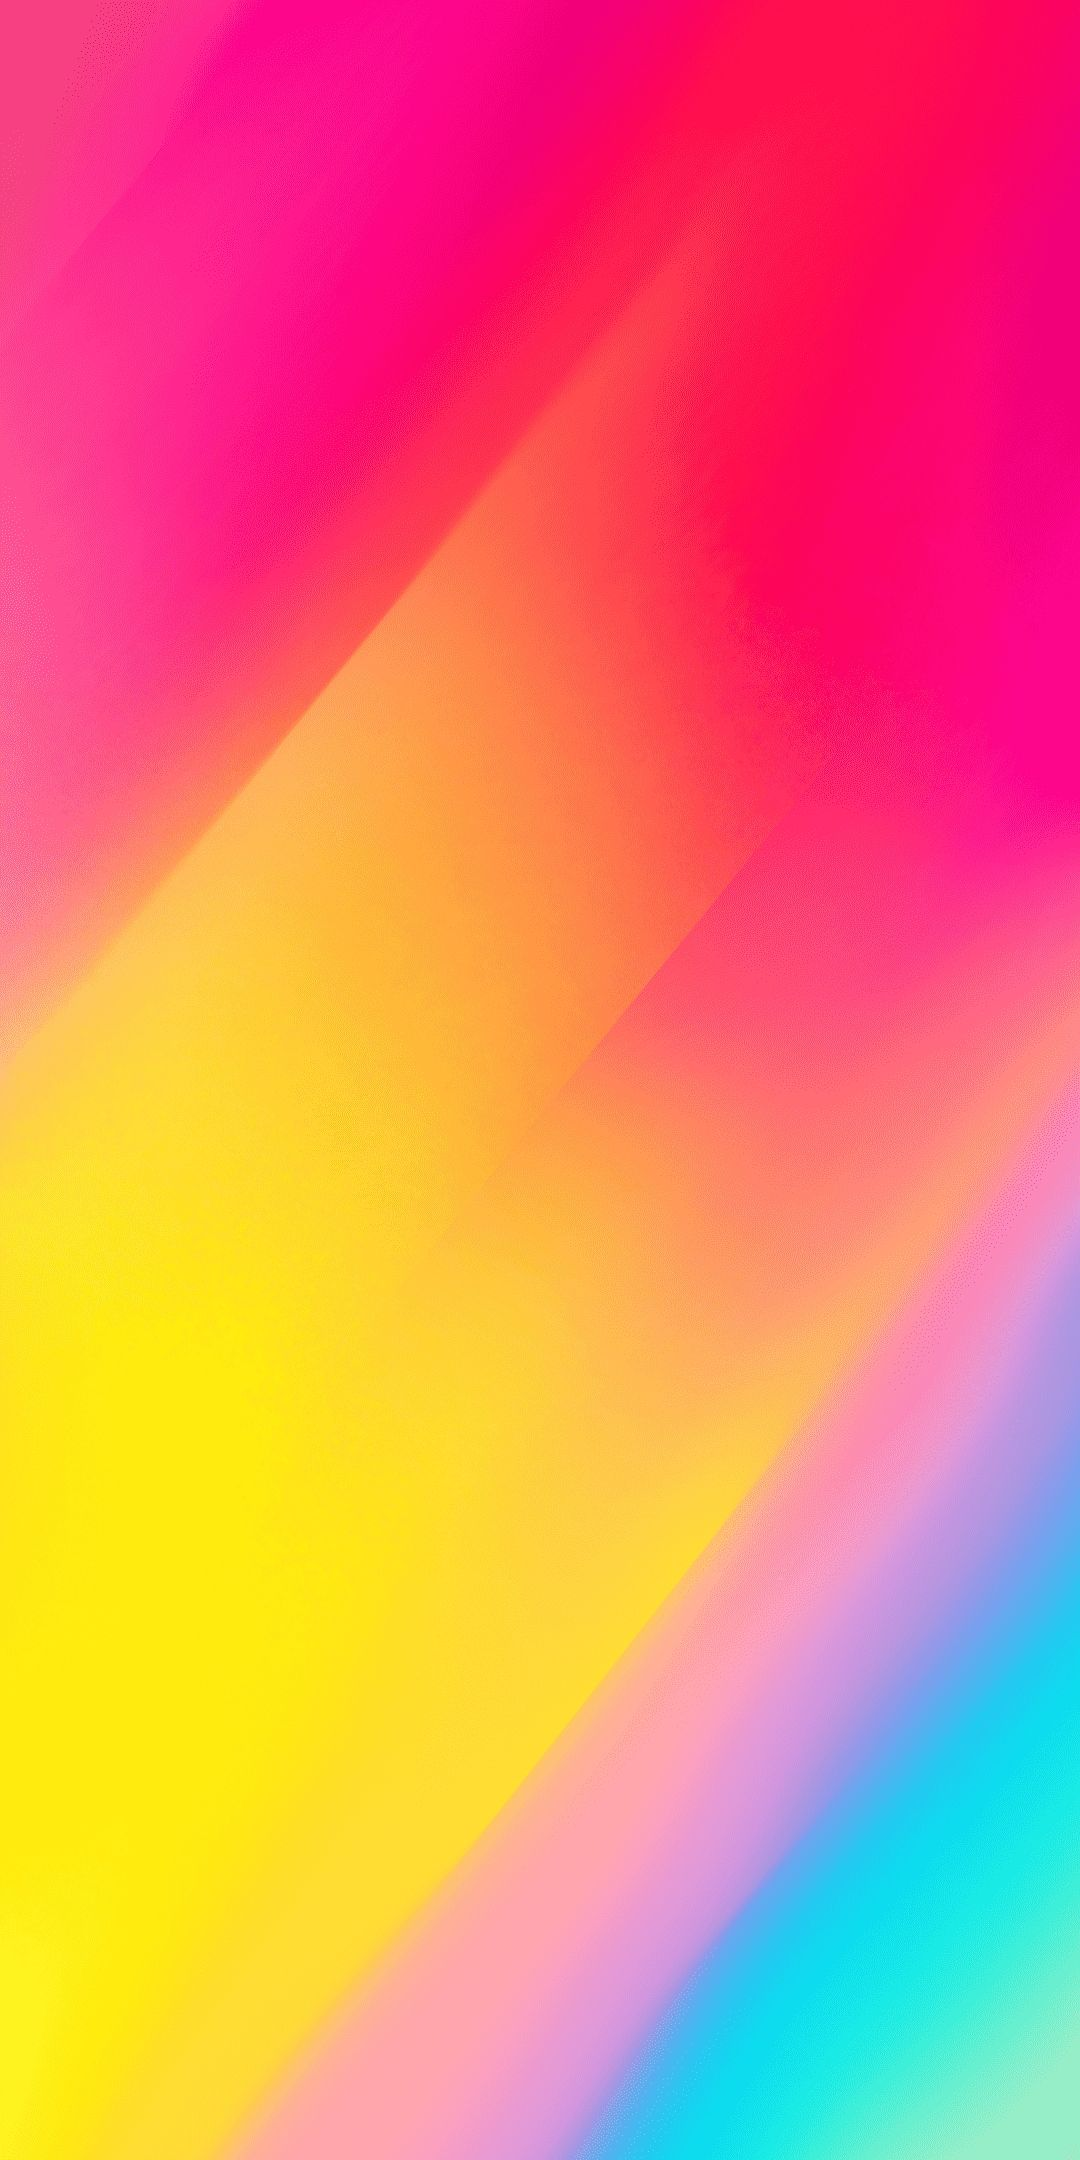 Sharp Aquos S3 Rainbow Colors Mobile Stock Wallpaper 3 Plain Wallpaper Iphone Graphic Wallpaper Screen Savers Wallpapers